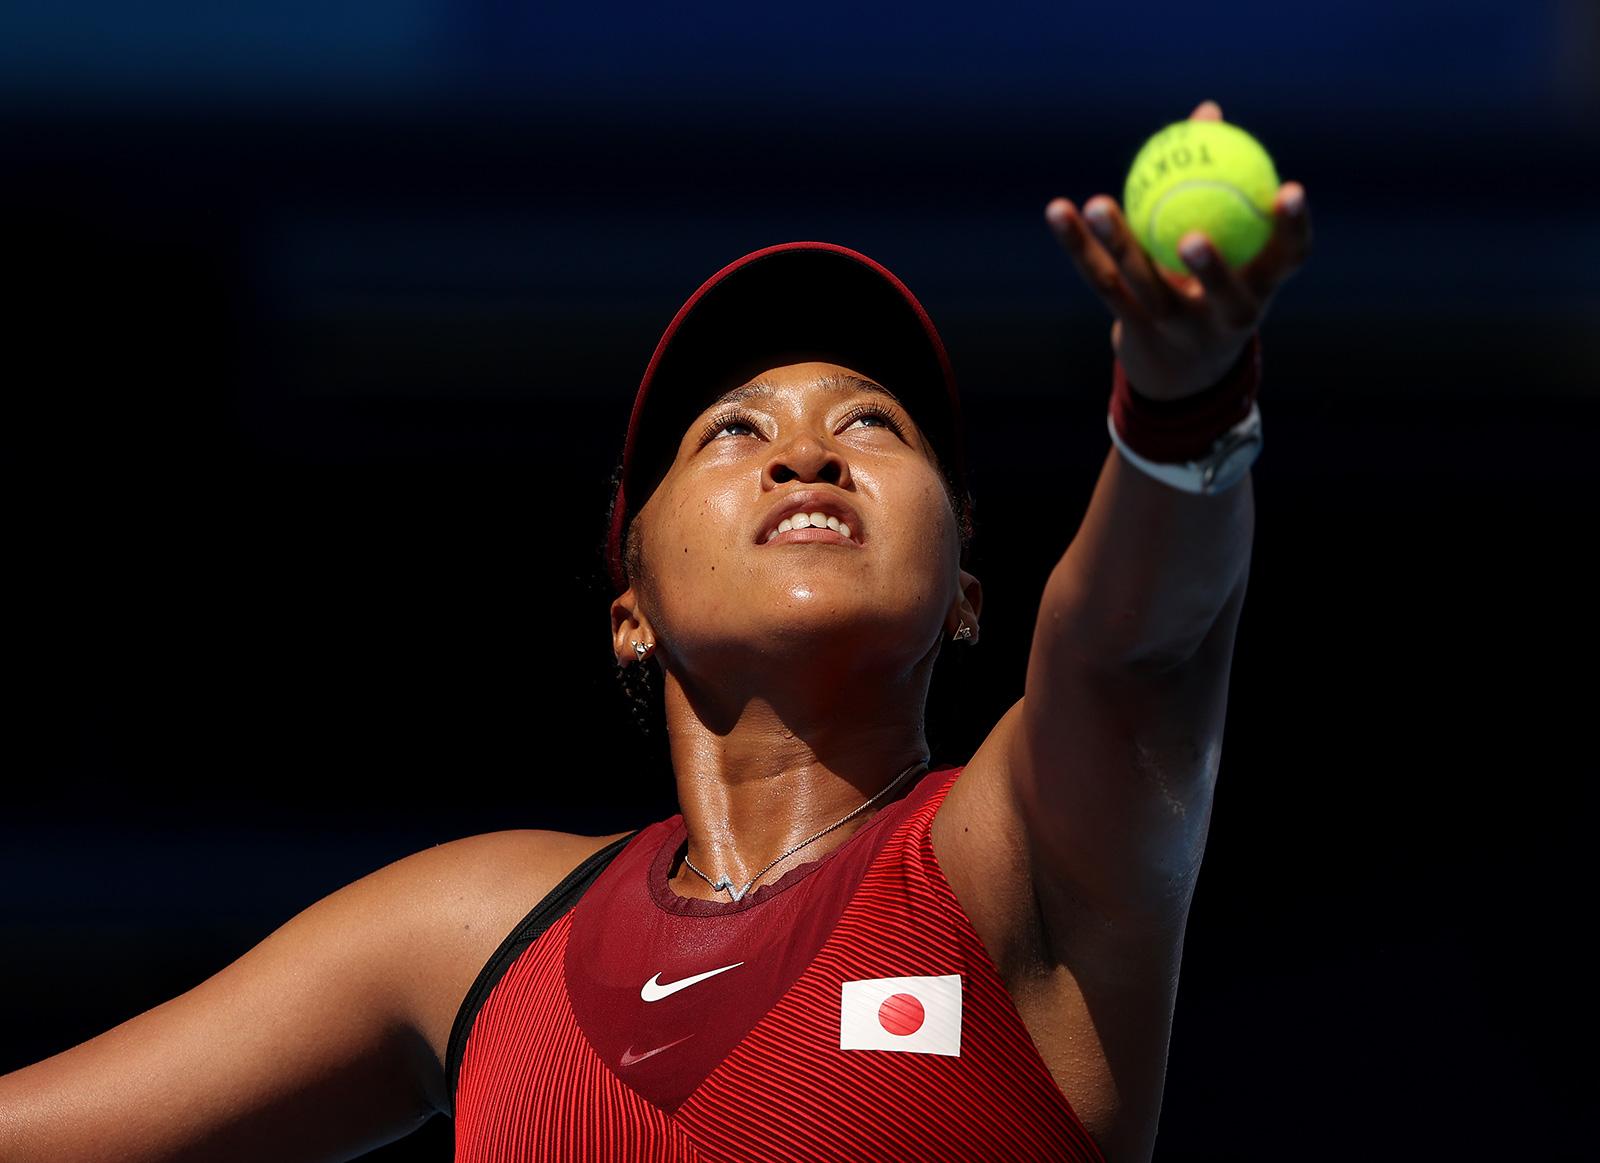 Japan's Naomi Osaka serves during her single's match against China's Saisai Zheng on July 25.